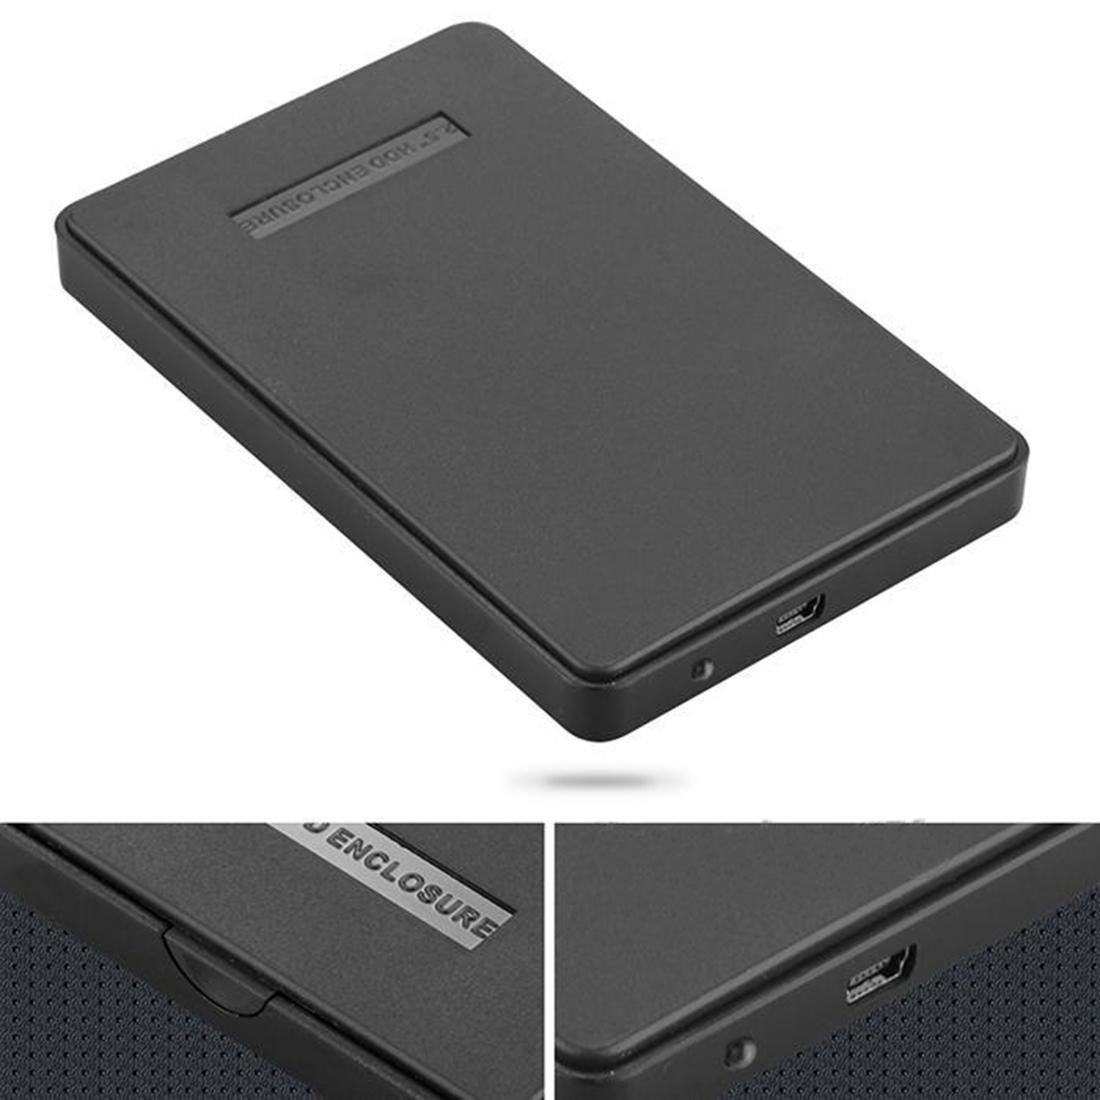 Silver 2.5 inch HDD IDE External Case Color : Black